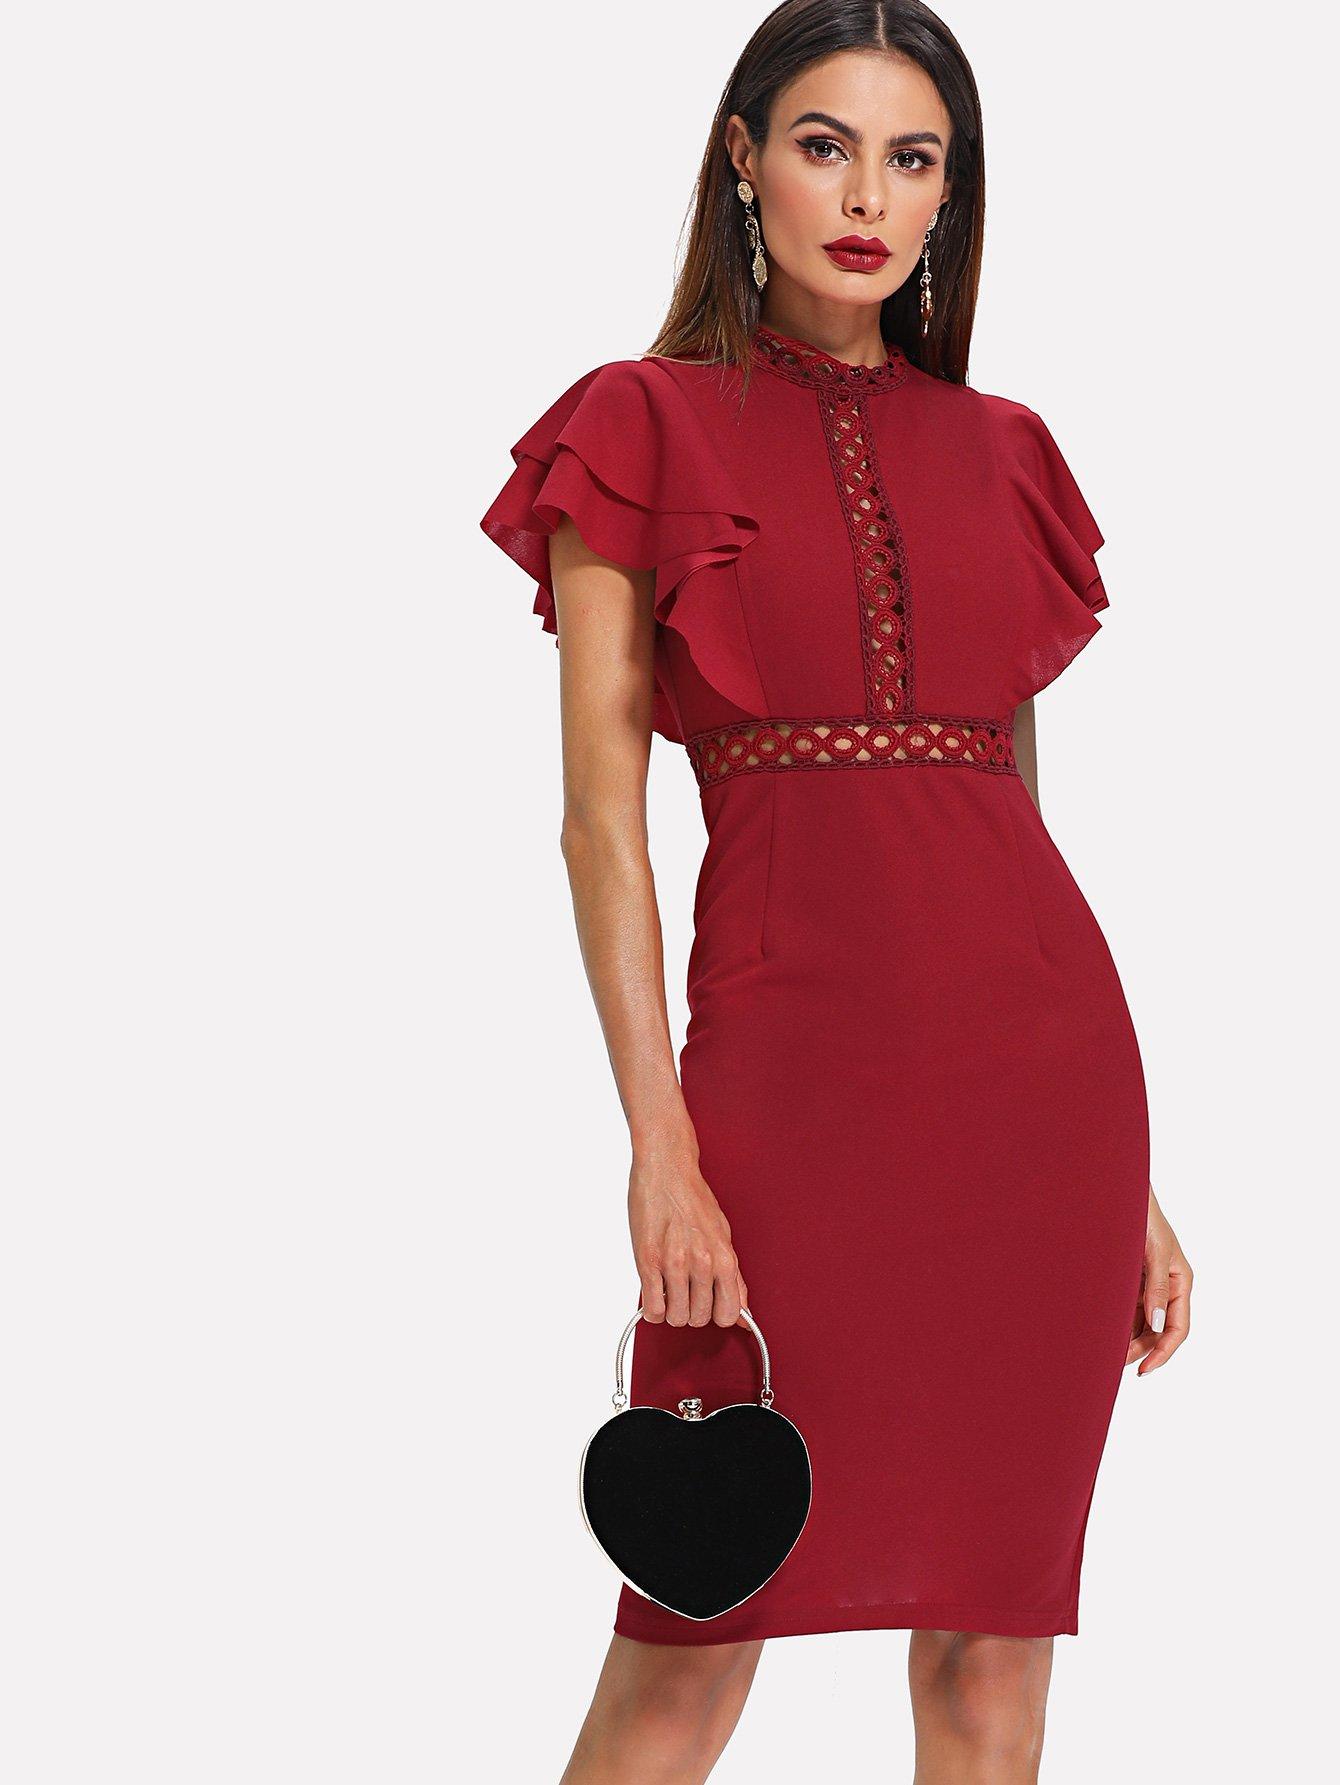 Eyelet Lace Insert Exaggerate Flounce Sleeve dress flounce sleeve eyelet embroidery dress